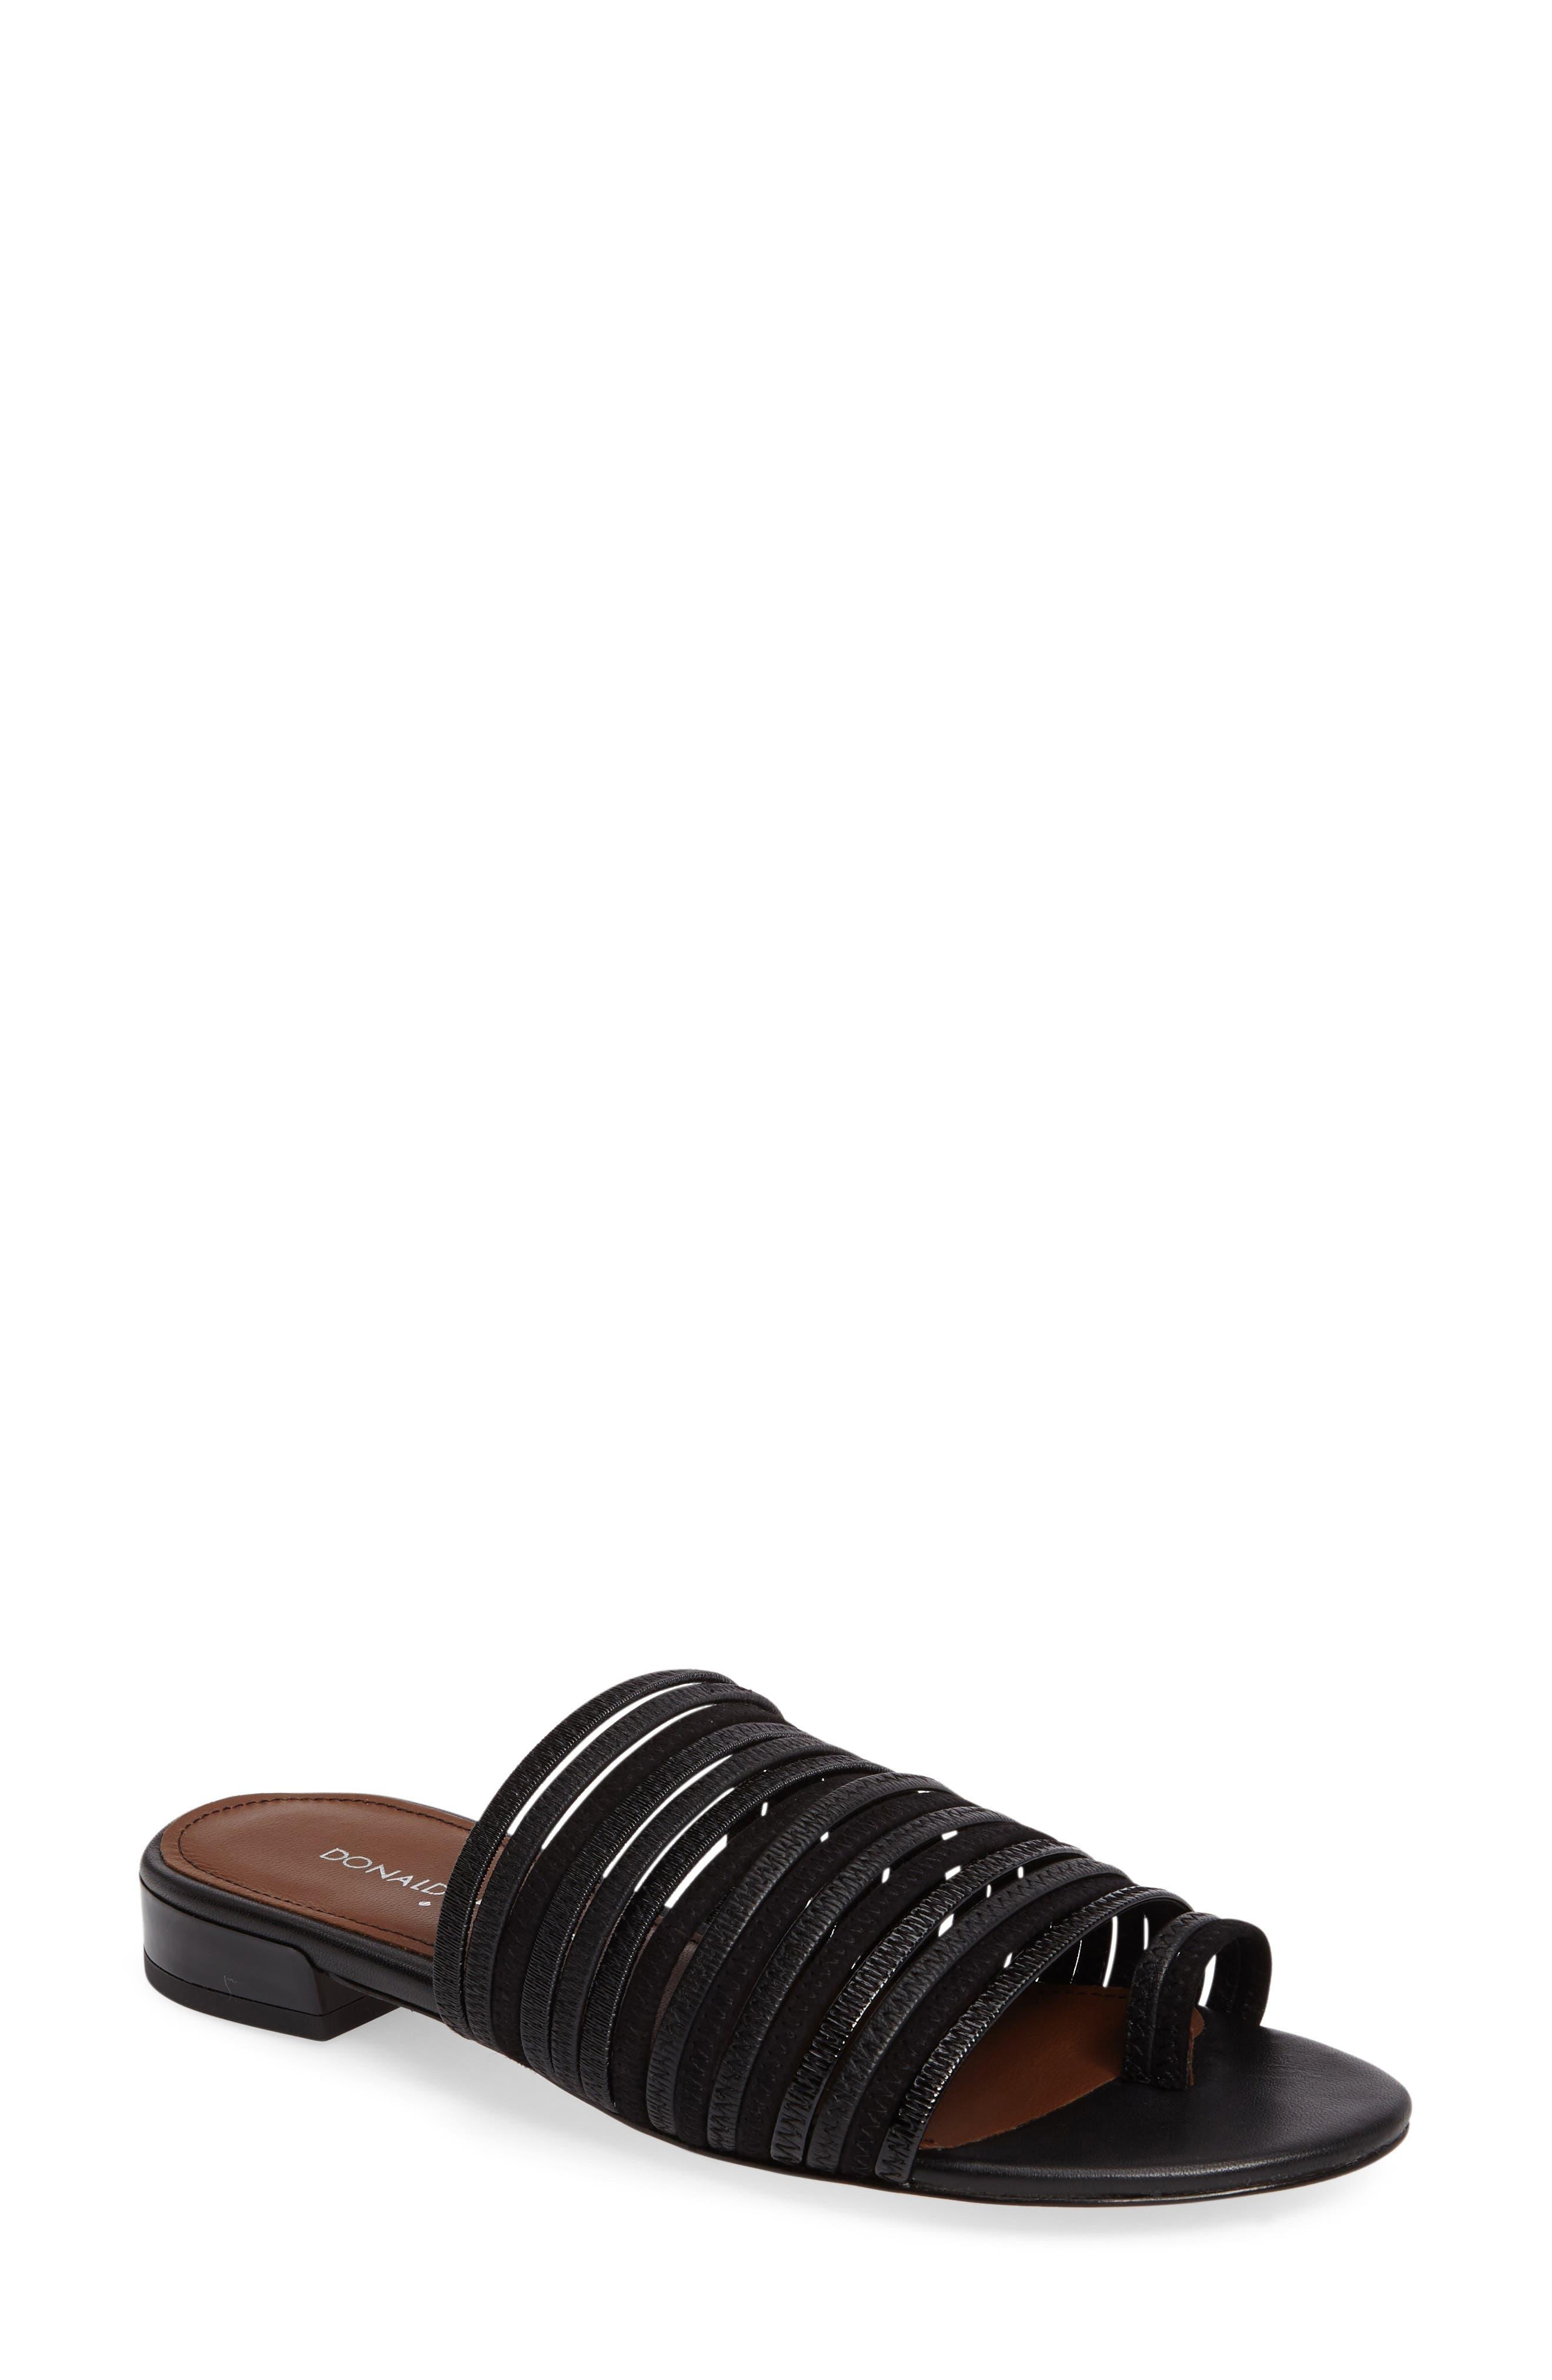 Frea Strappy Sandal,                             Main thumbnail 1, color,